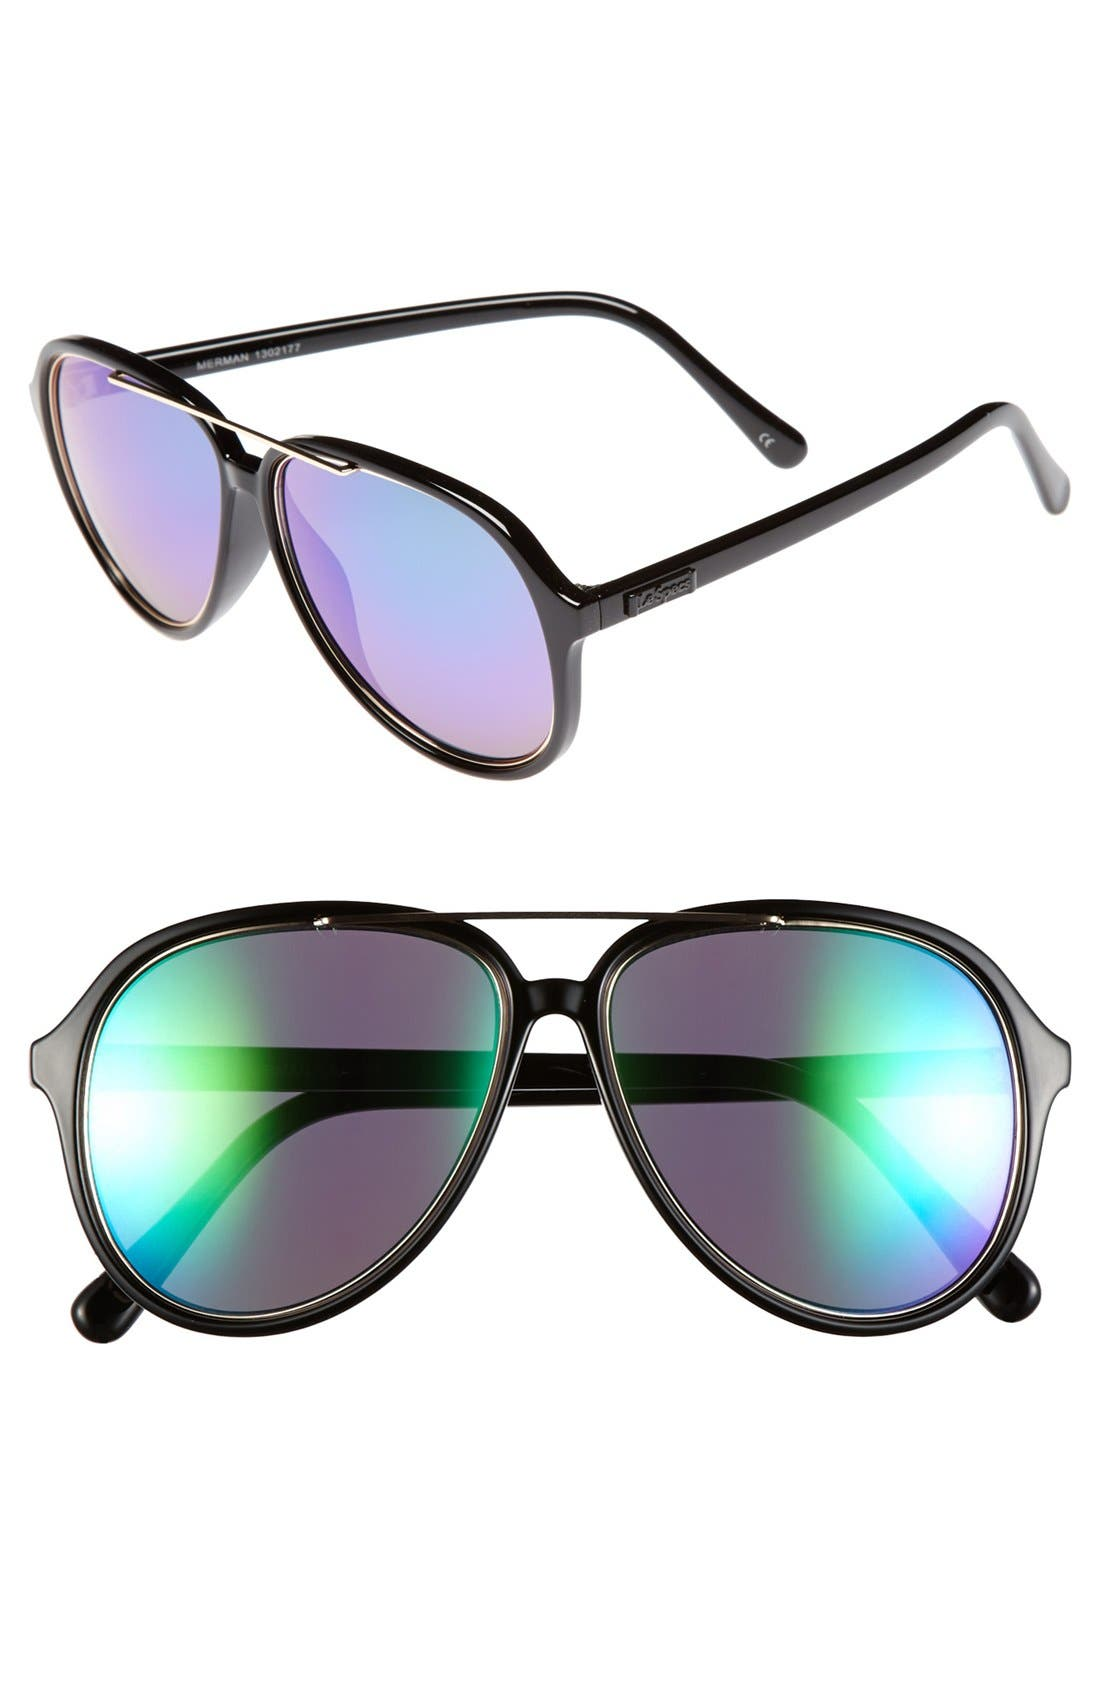 Main Image - Le Specs 'Merman' 58mm Aviator Sunglasses